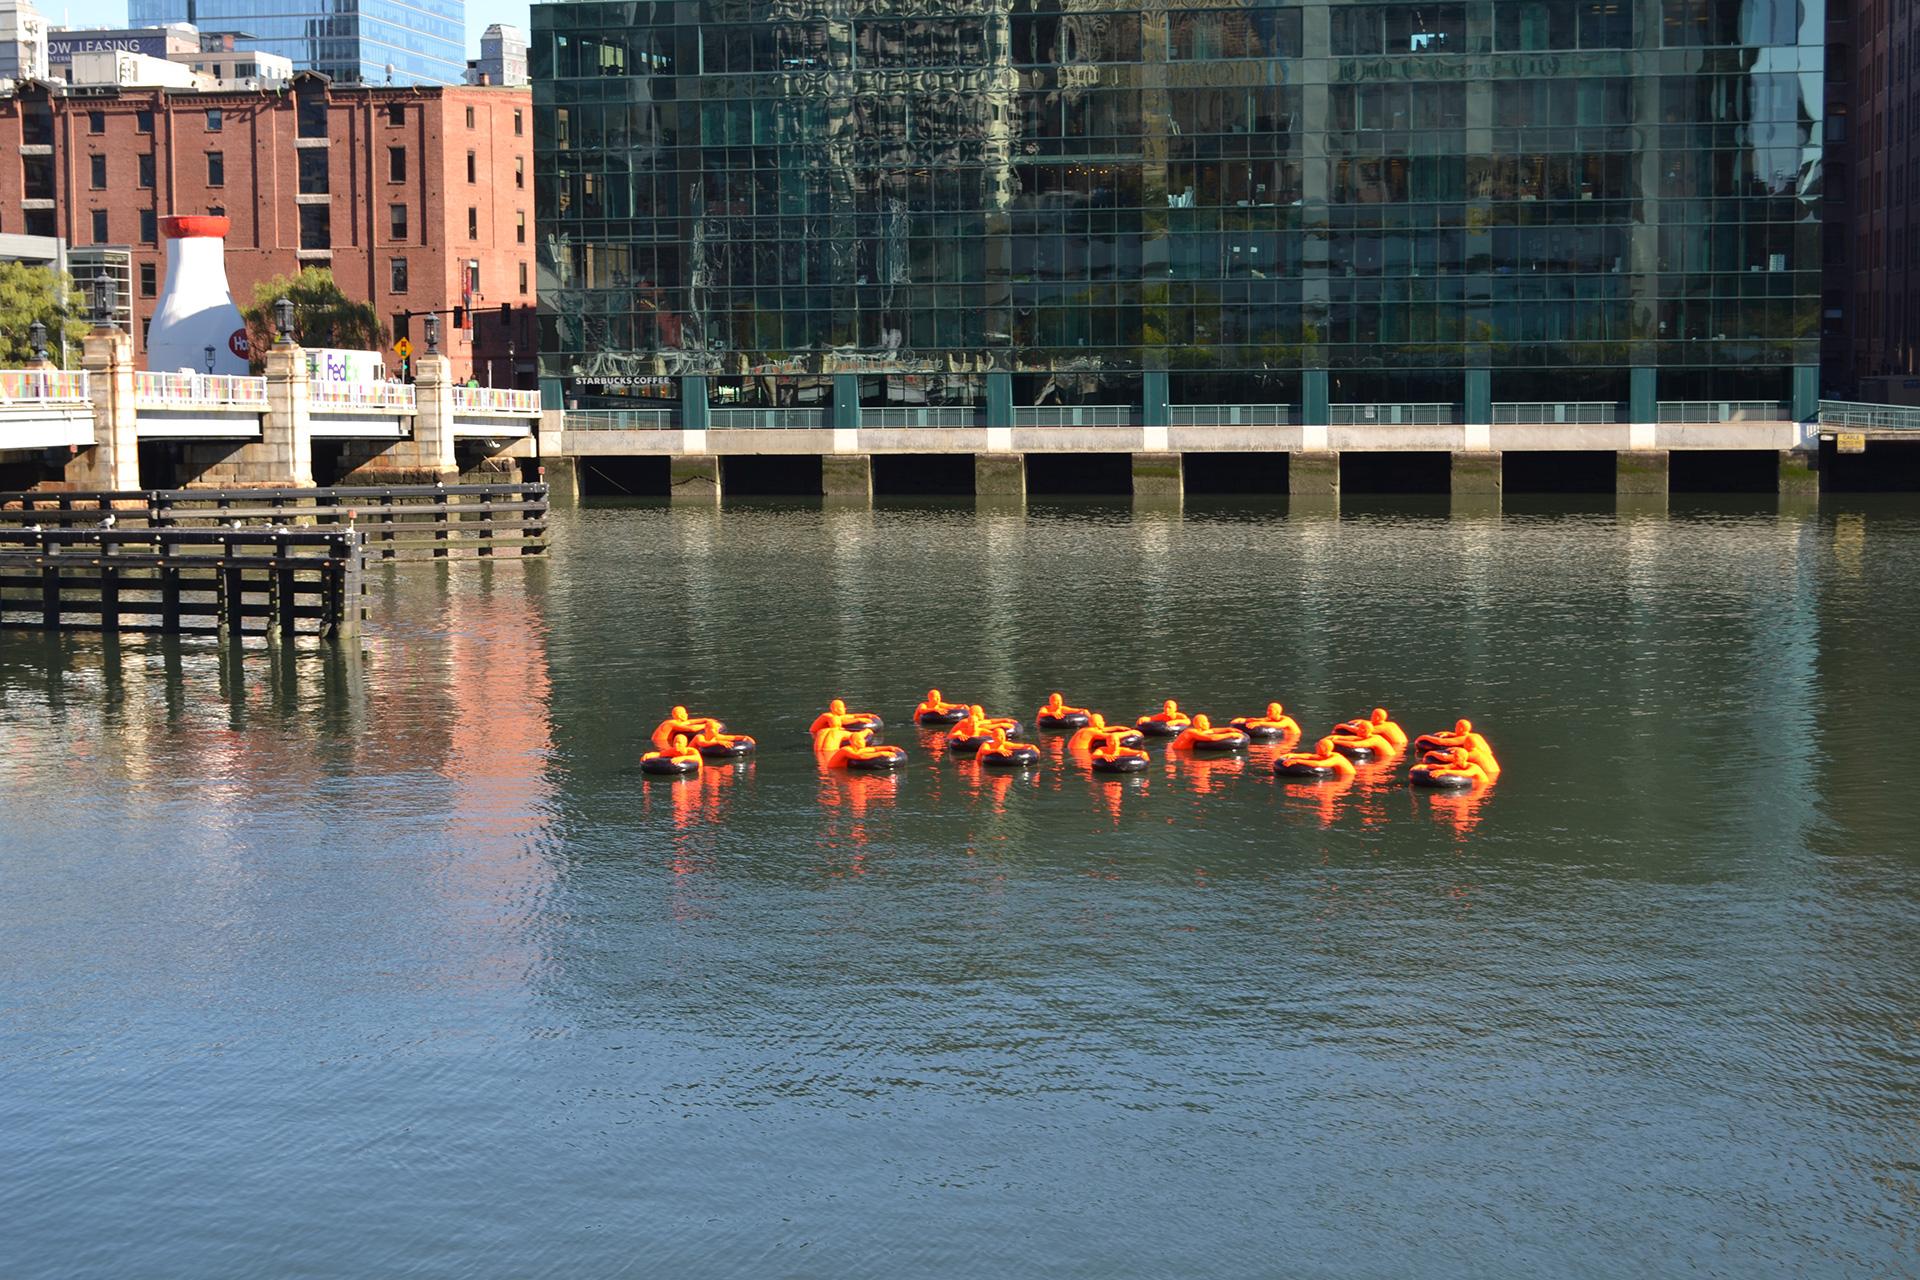 SOS (Safety Orange Swimmers)